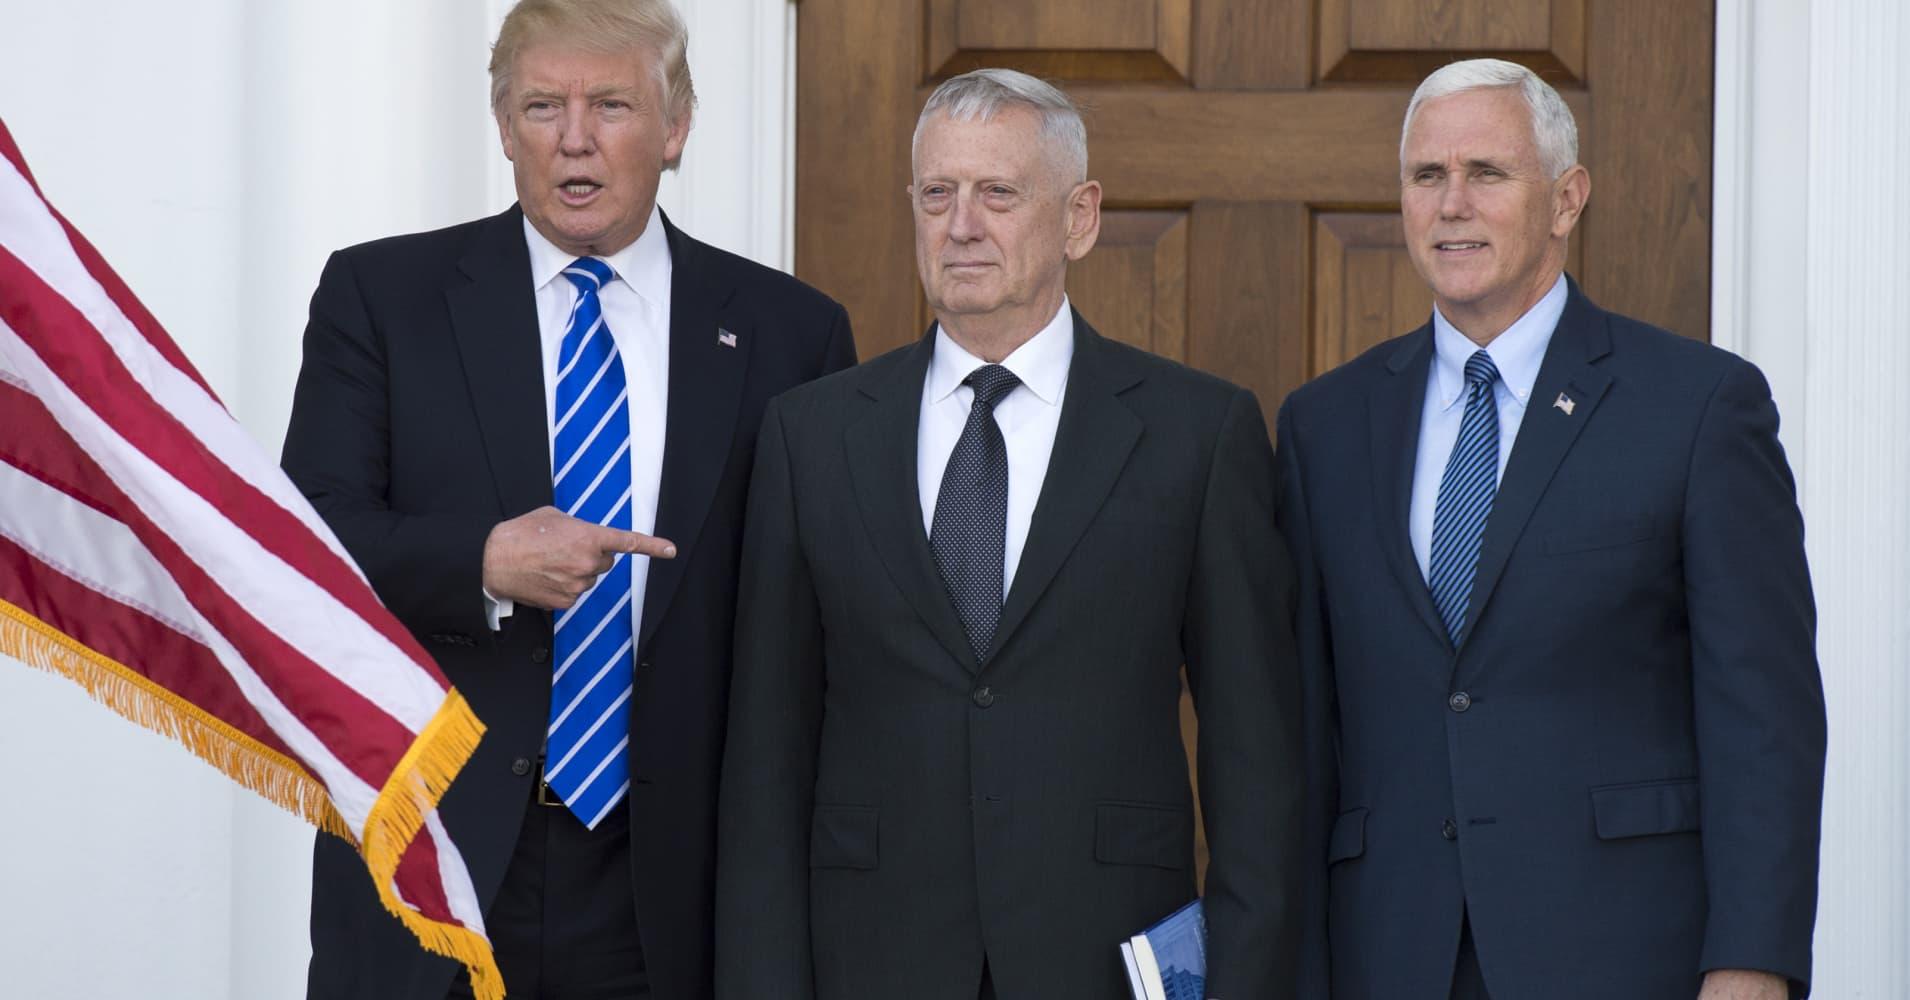 Trump picks tough talking Gen. James 'Mad Dog' Mattis as Defense Secretary